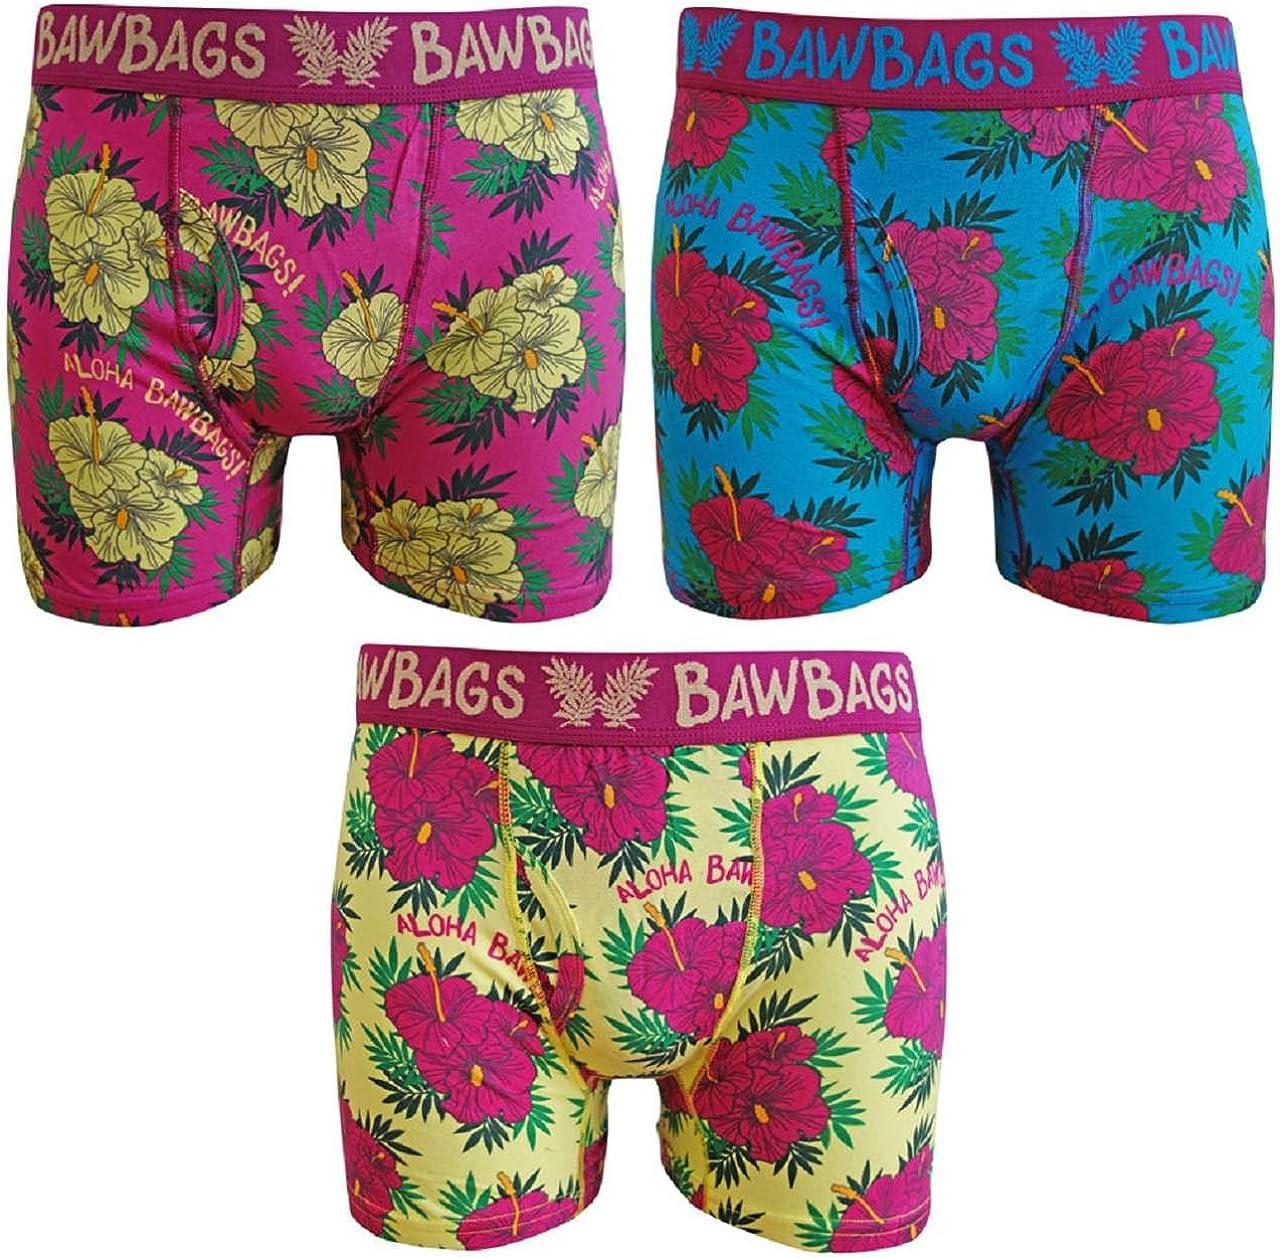 BawBags 3 Pack Boxers Aloha